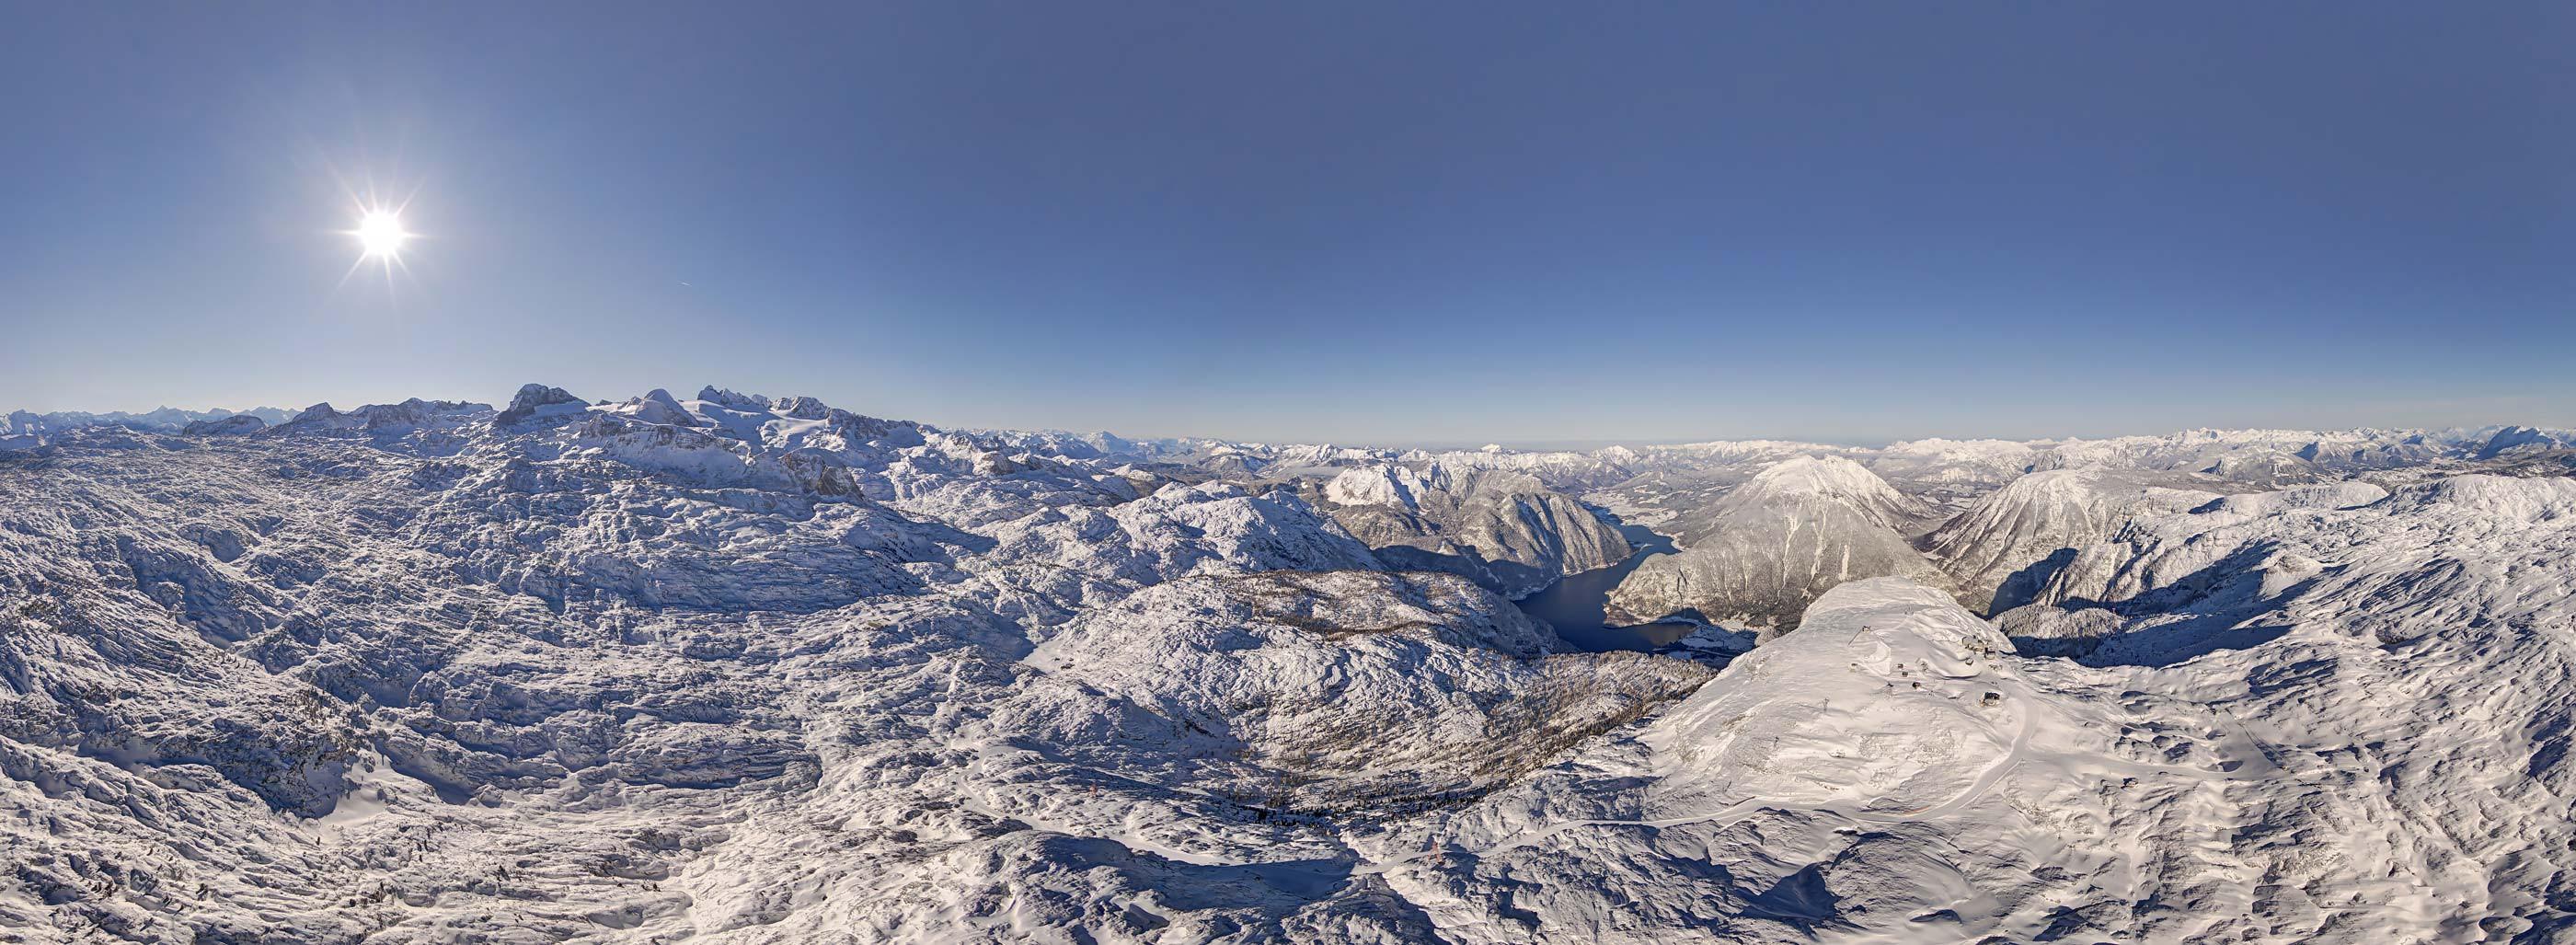 Panorama-Krippenstein-Winter-Small-Foto-